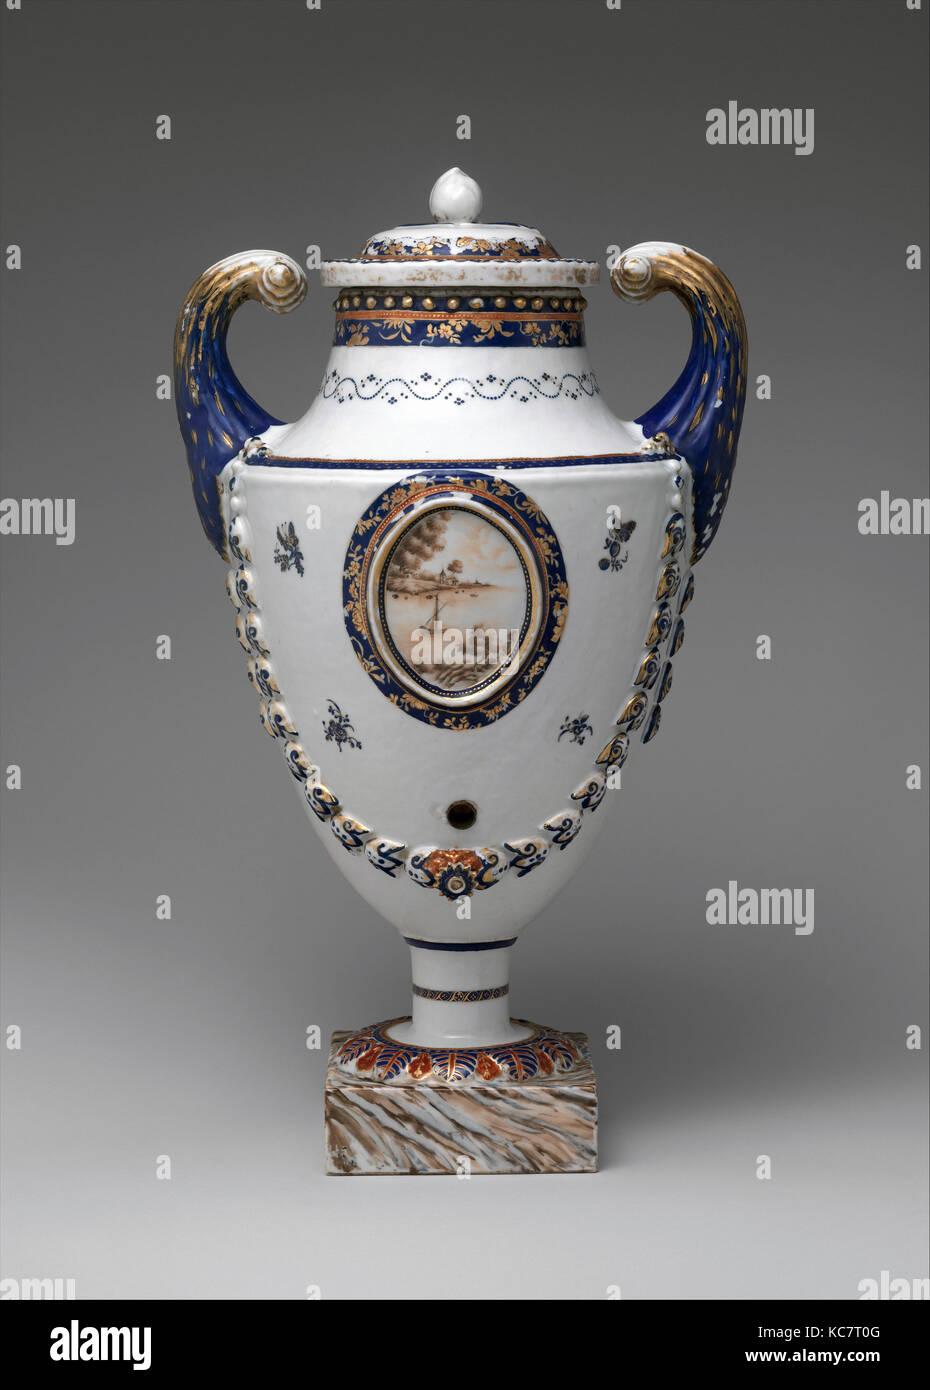 Covered Urn, ca. 1800, Made in China; Object place NEW ZEALAND ROTORUA WHAKAREWAREWA, Chinese, Porcelain, 17 1/2 - Stock Image